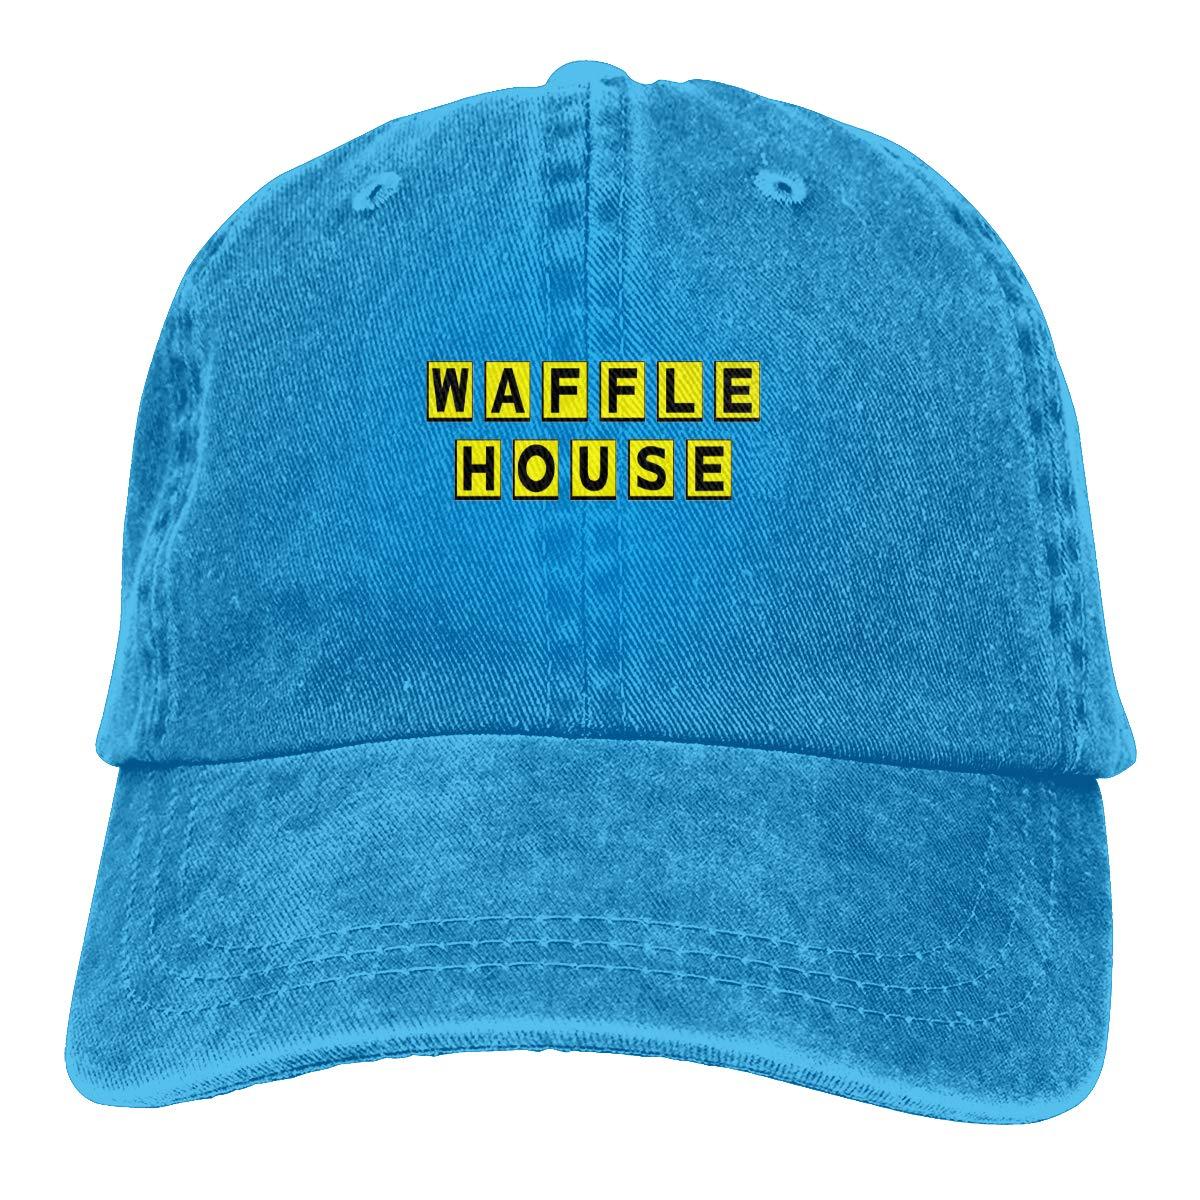 Eugrandet Waffle House Unisex Baseball Cap Twill Adjustable Hat